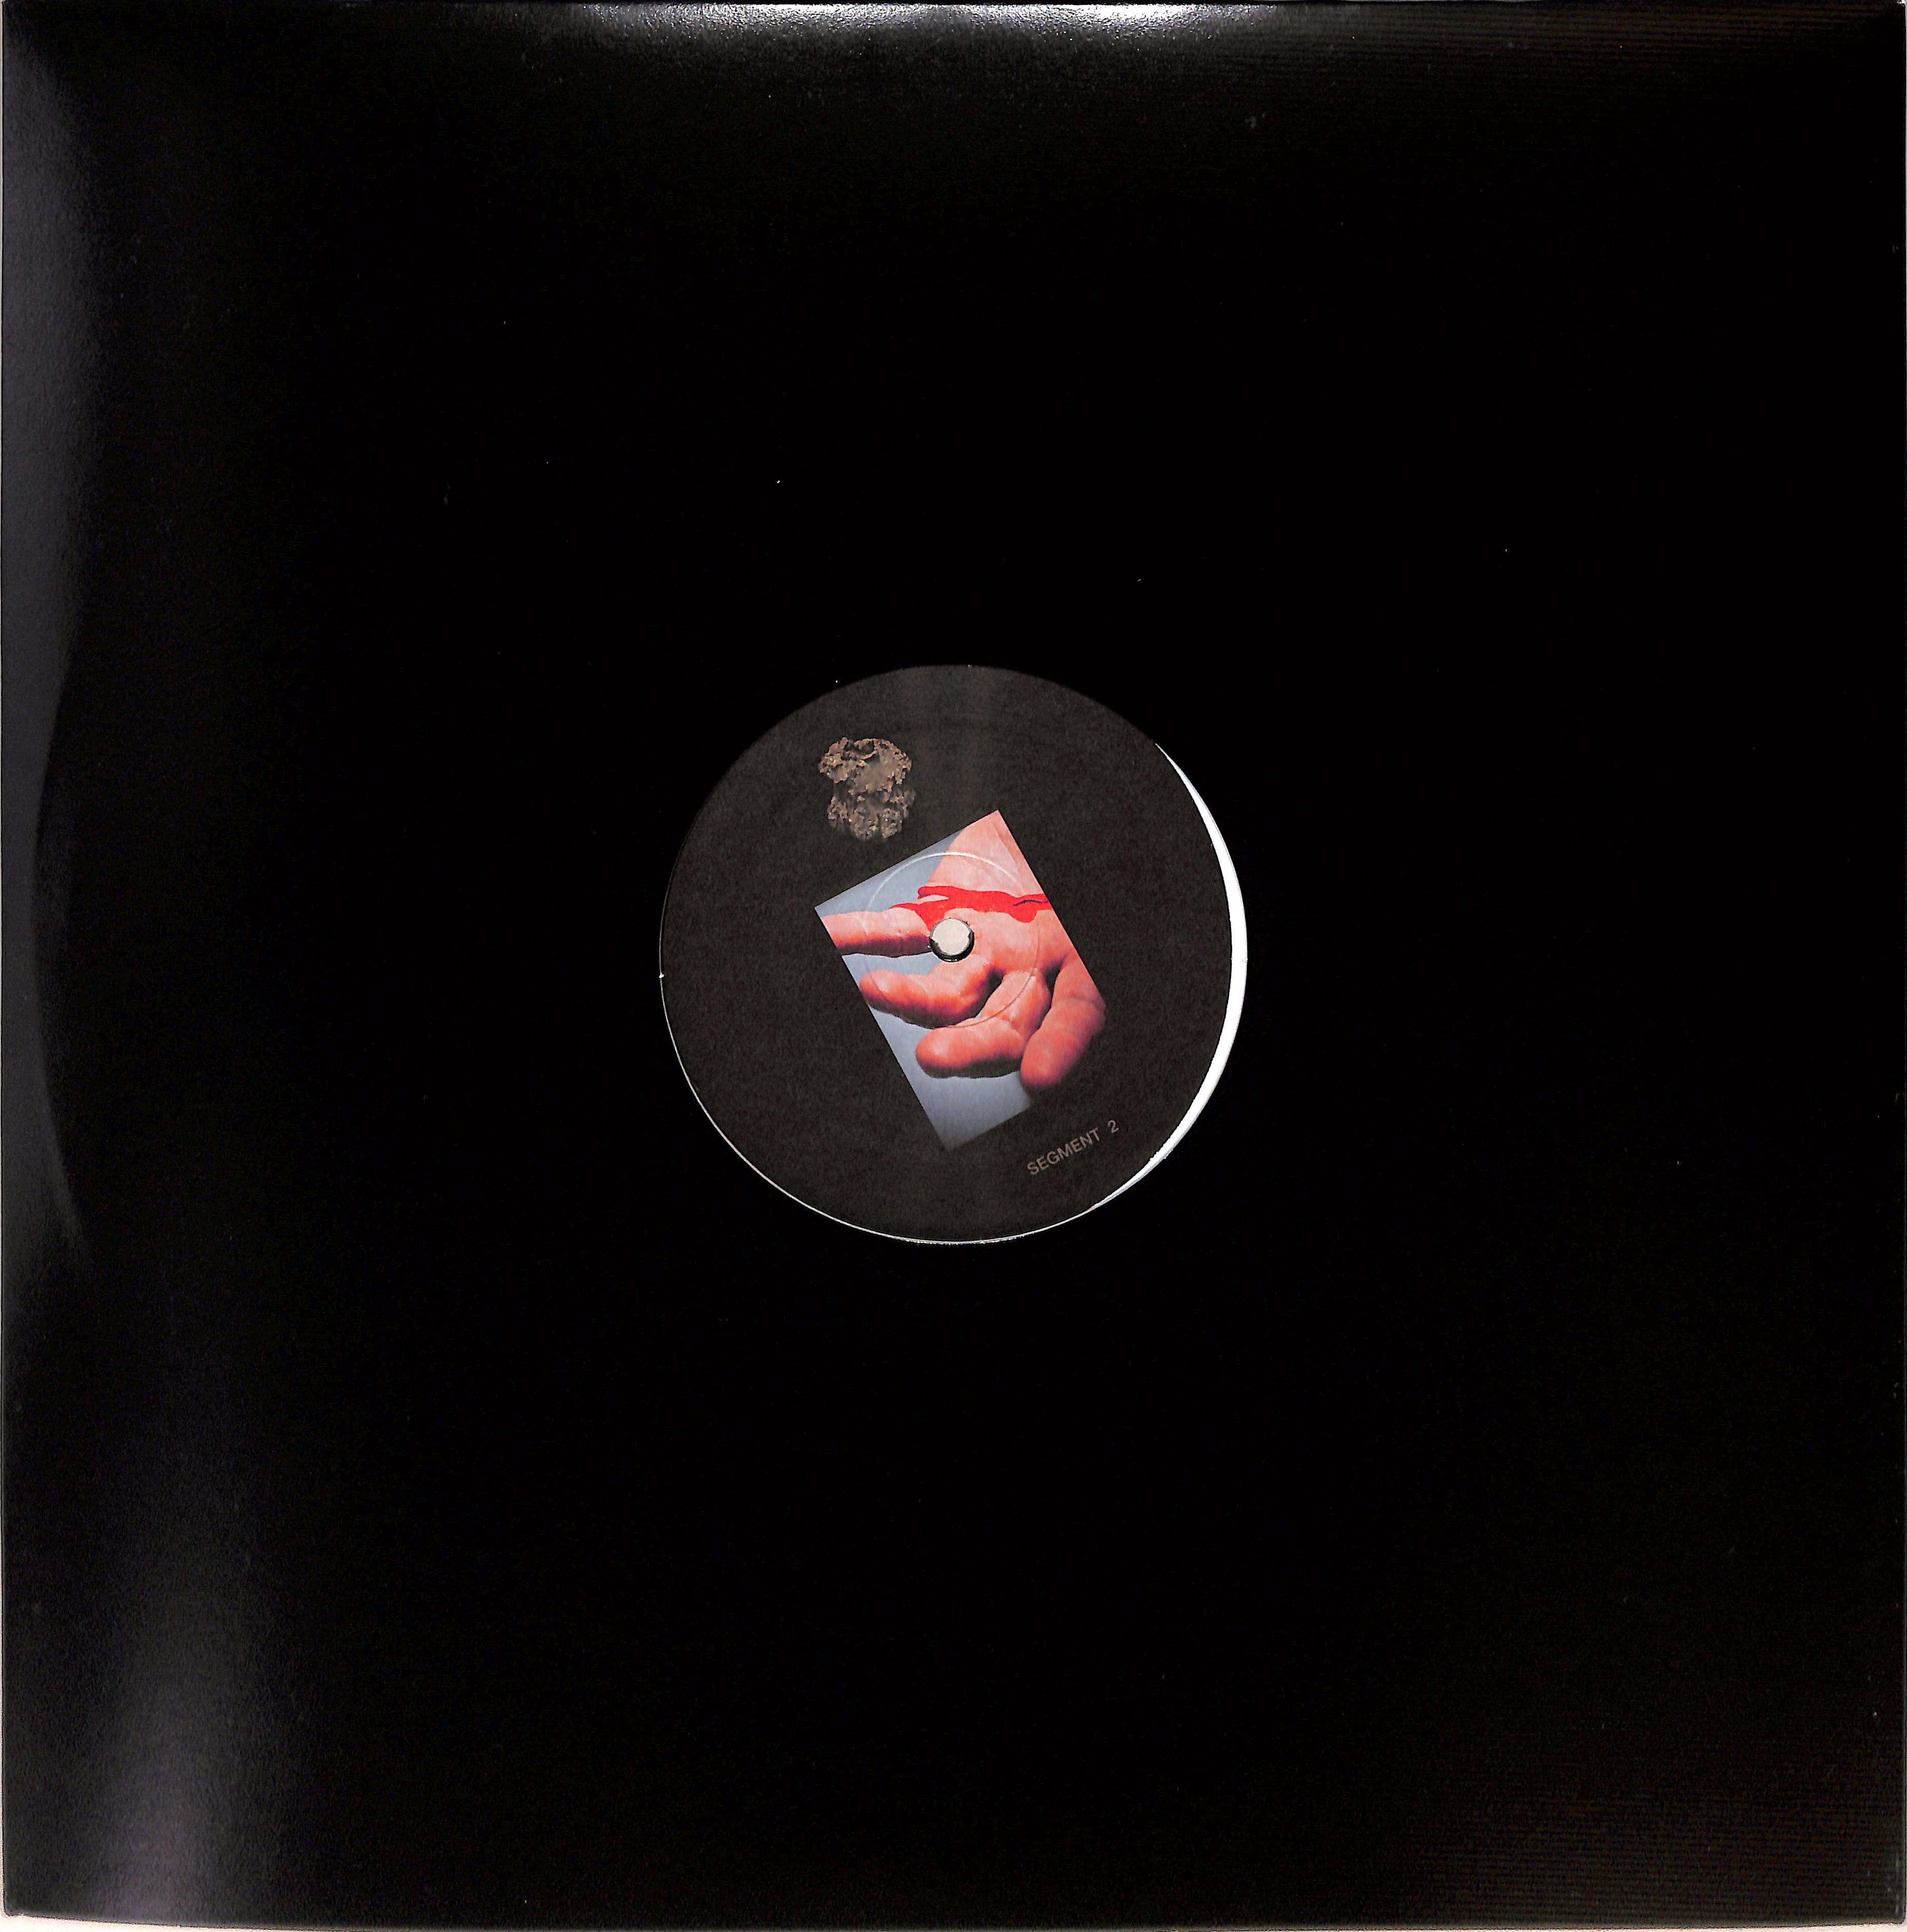 Developer - SANGRE POR ORO LP - PART B